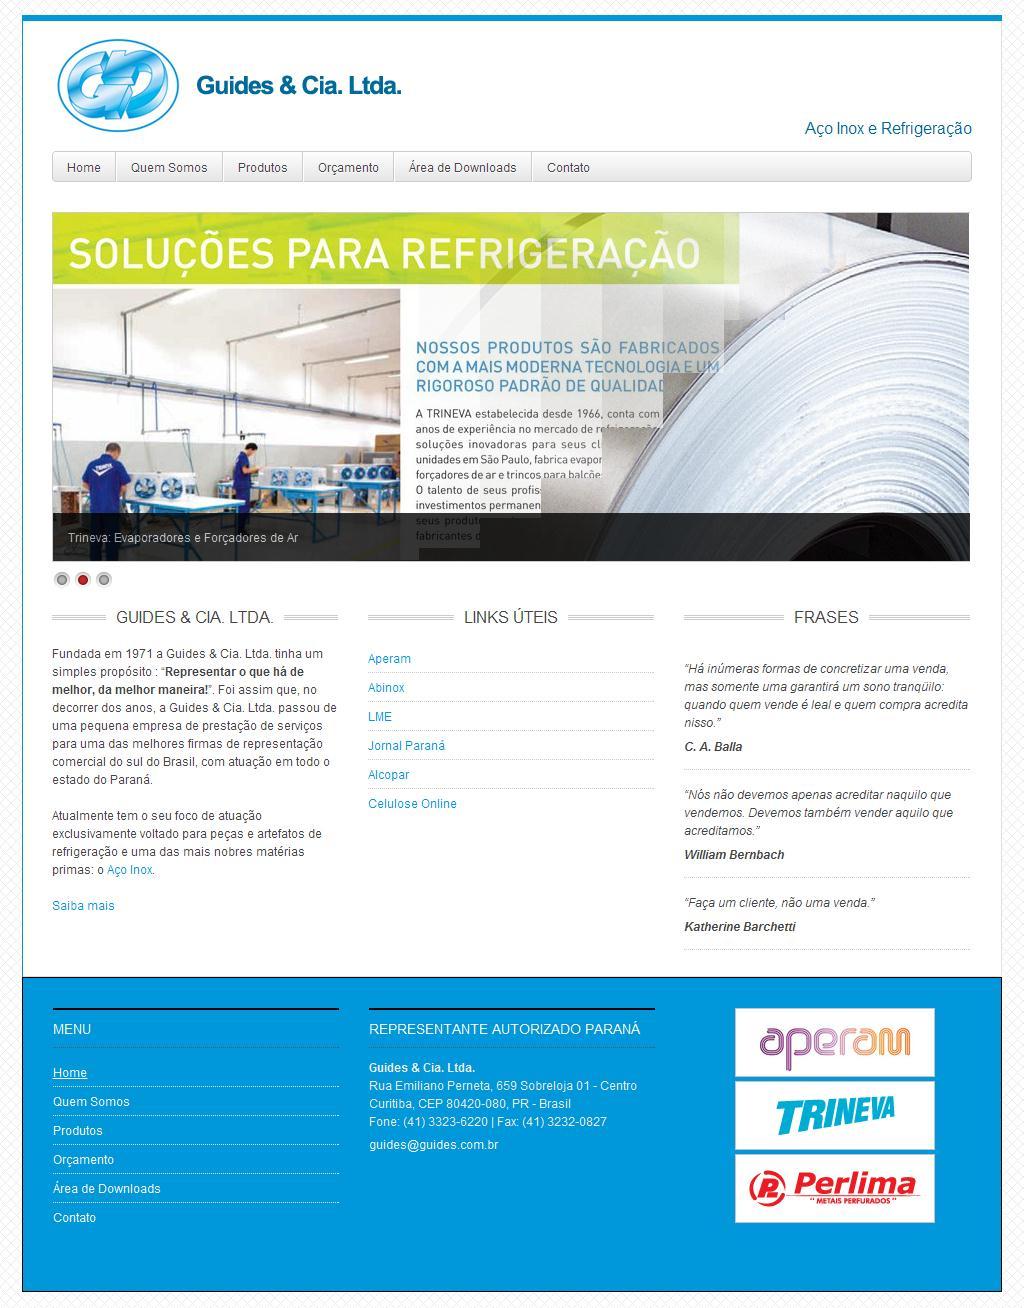 Guides & Cia. Ltda.